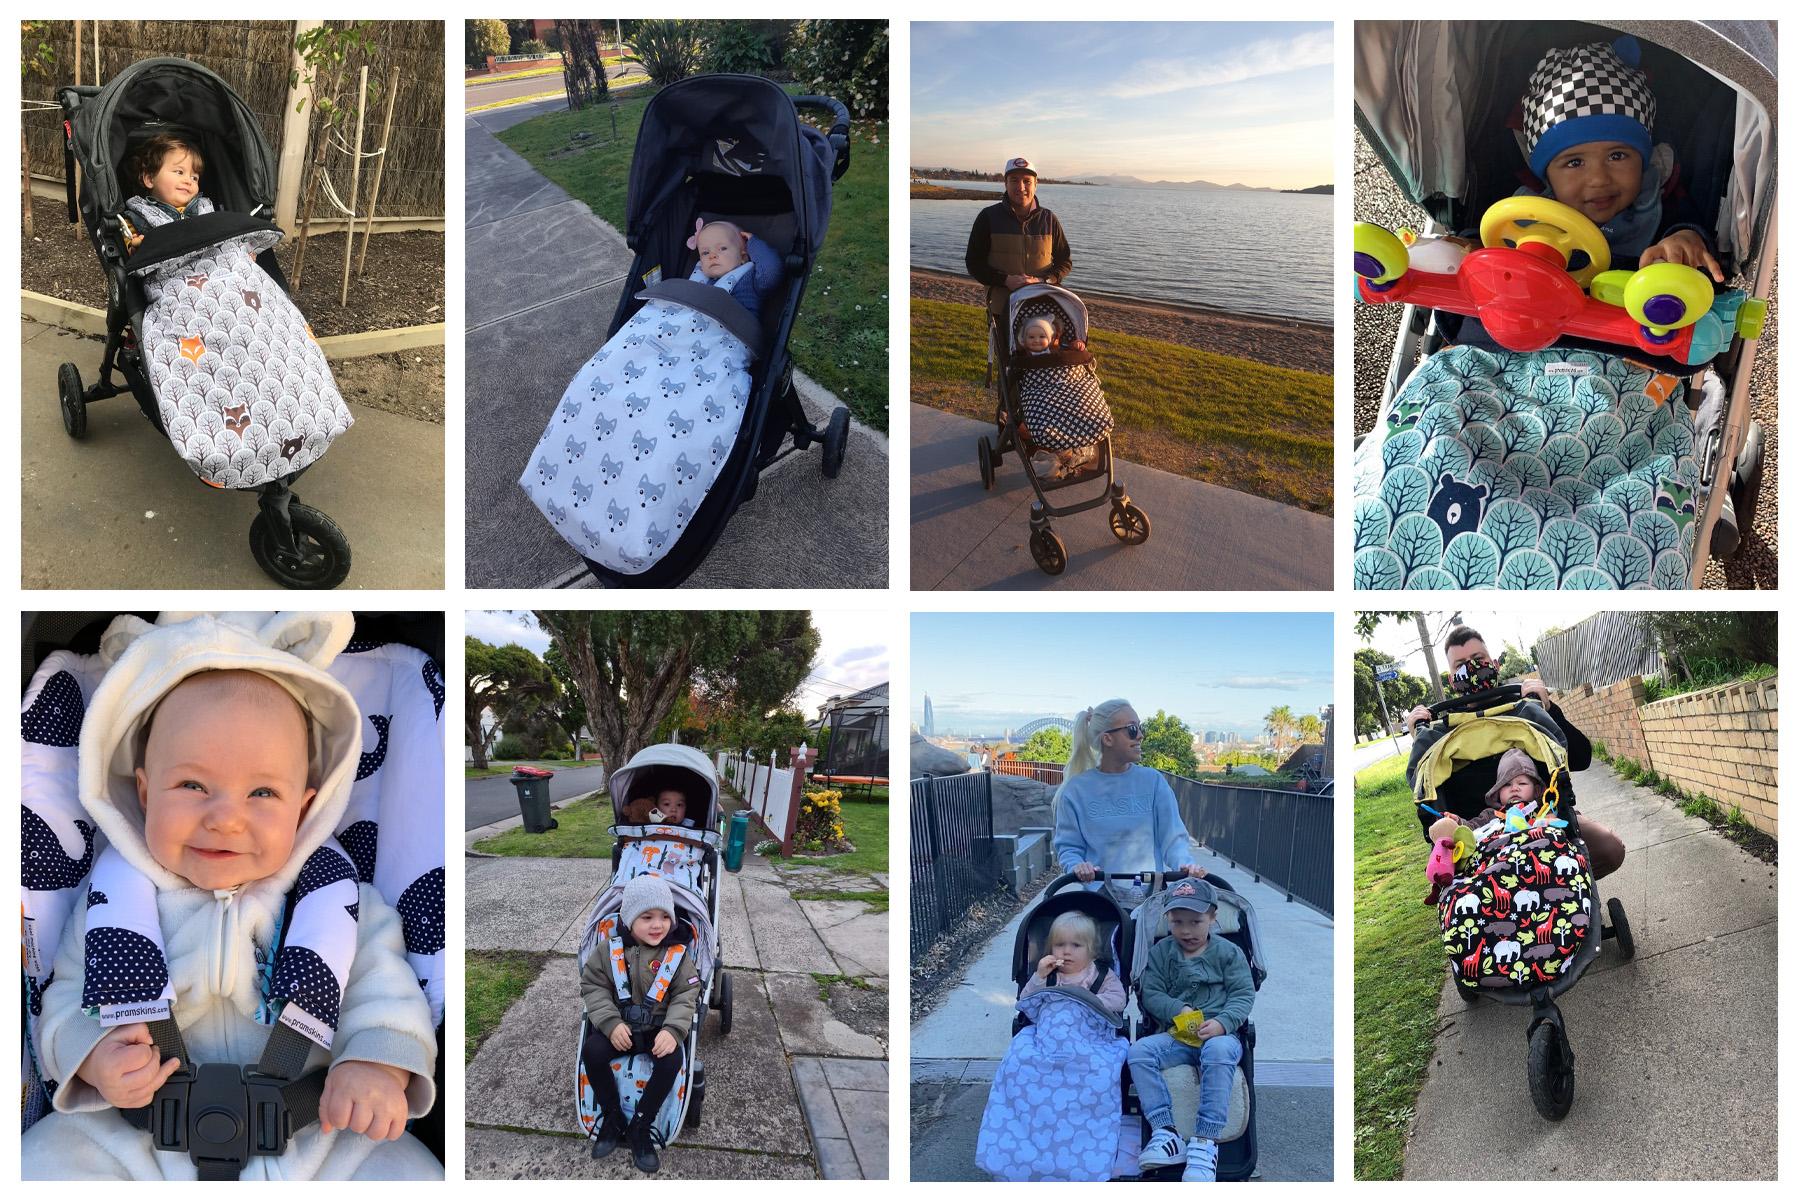 photo-collage-customer-photos-sep2020.jpg